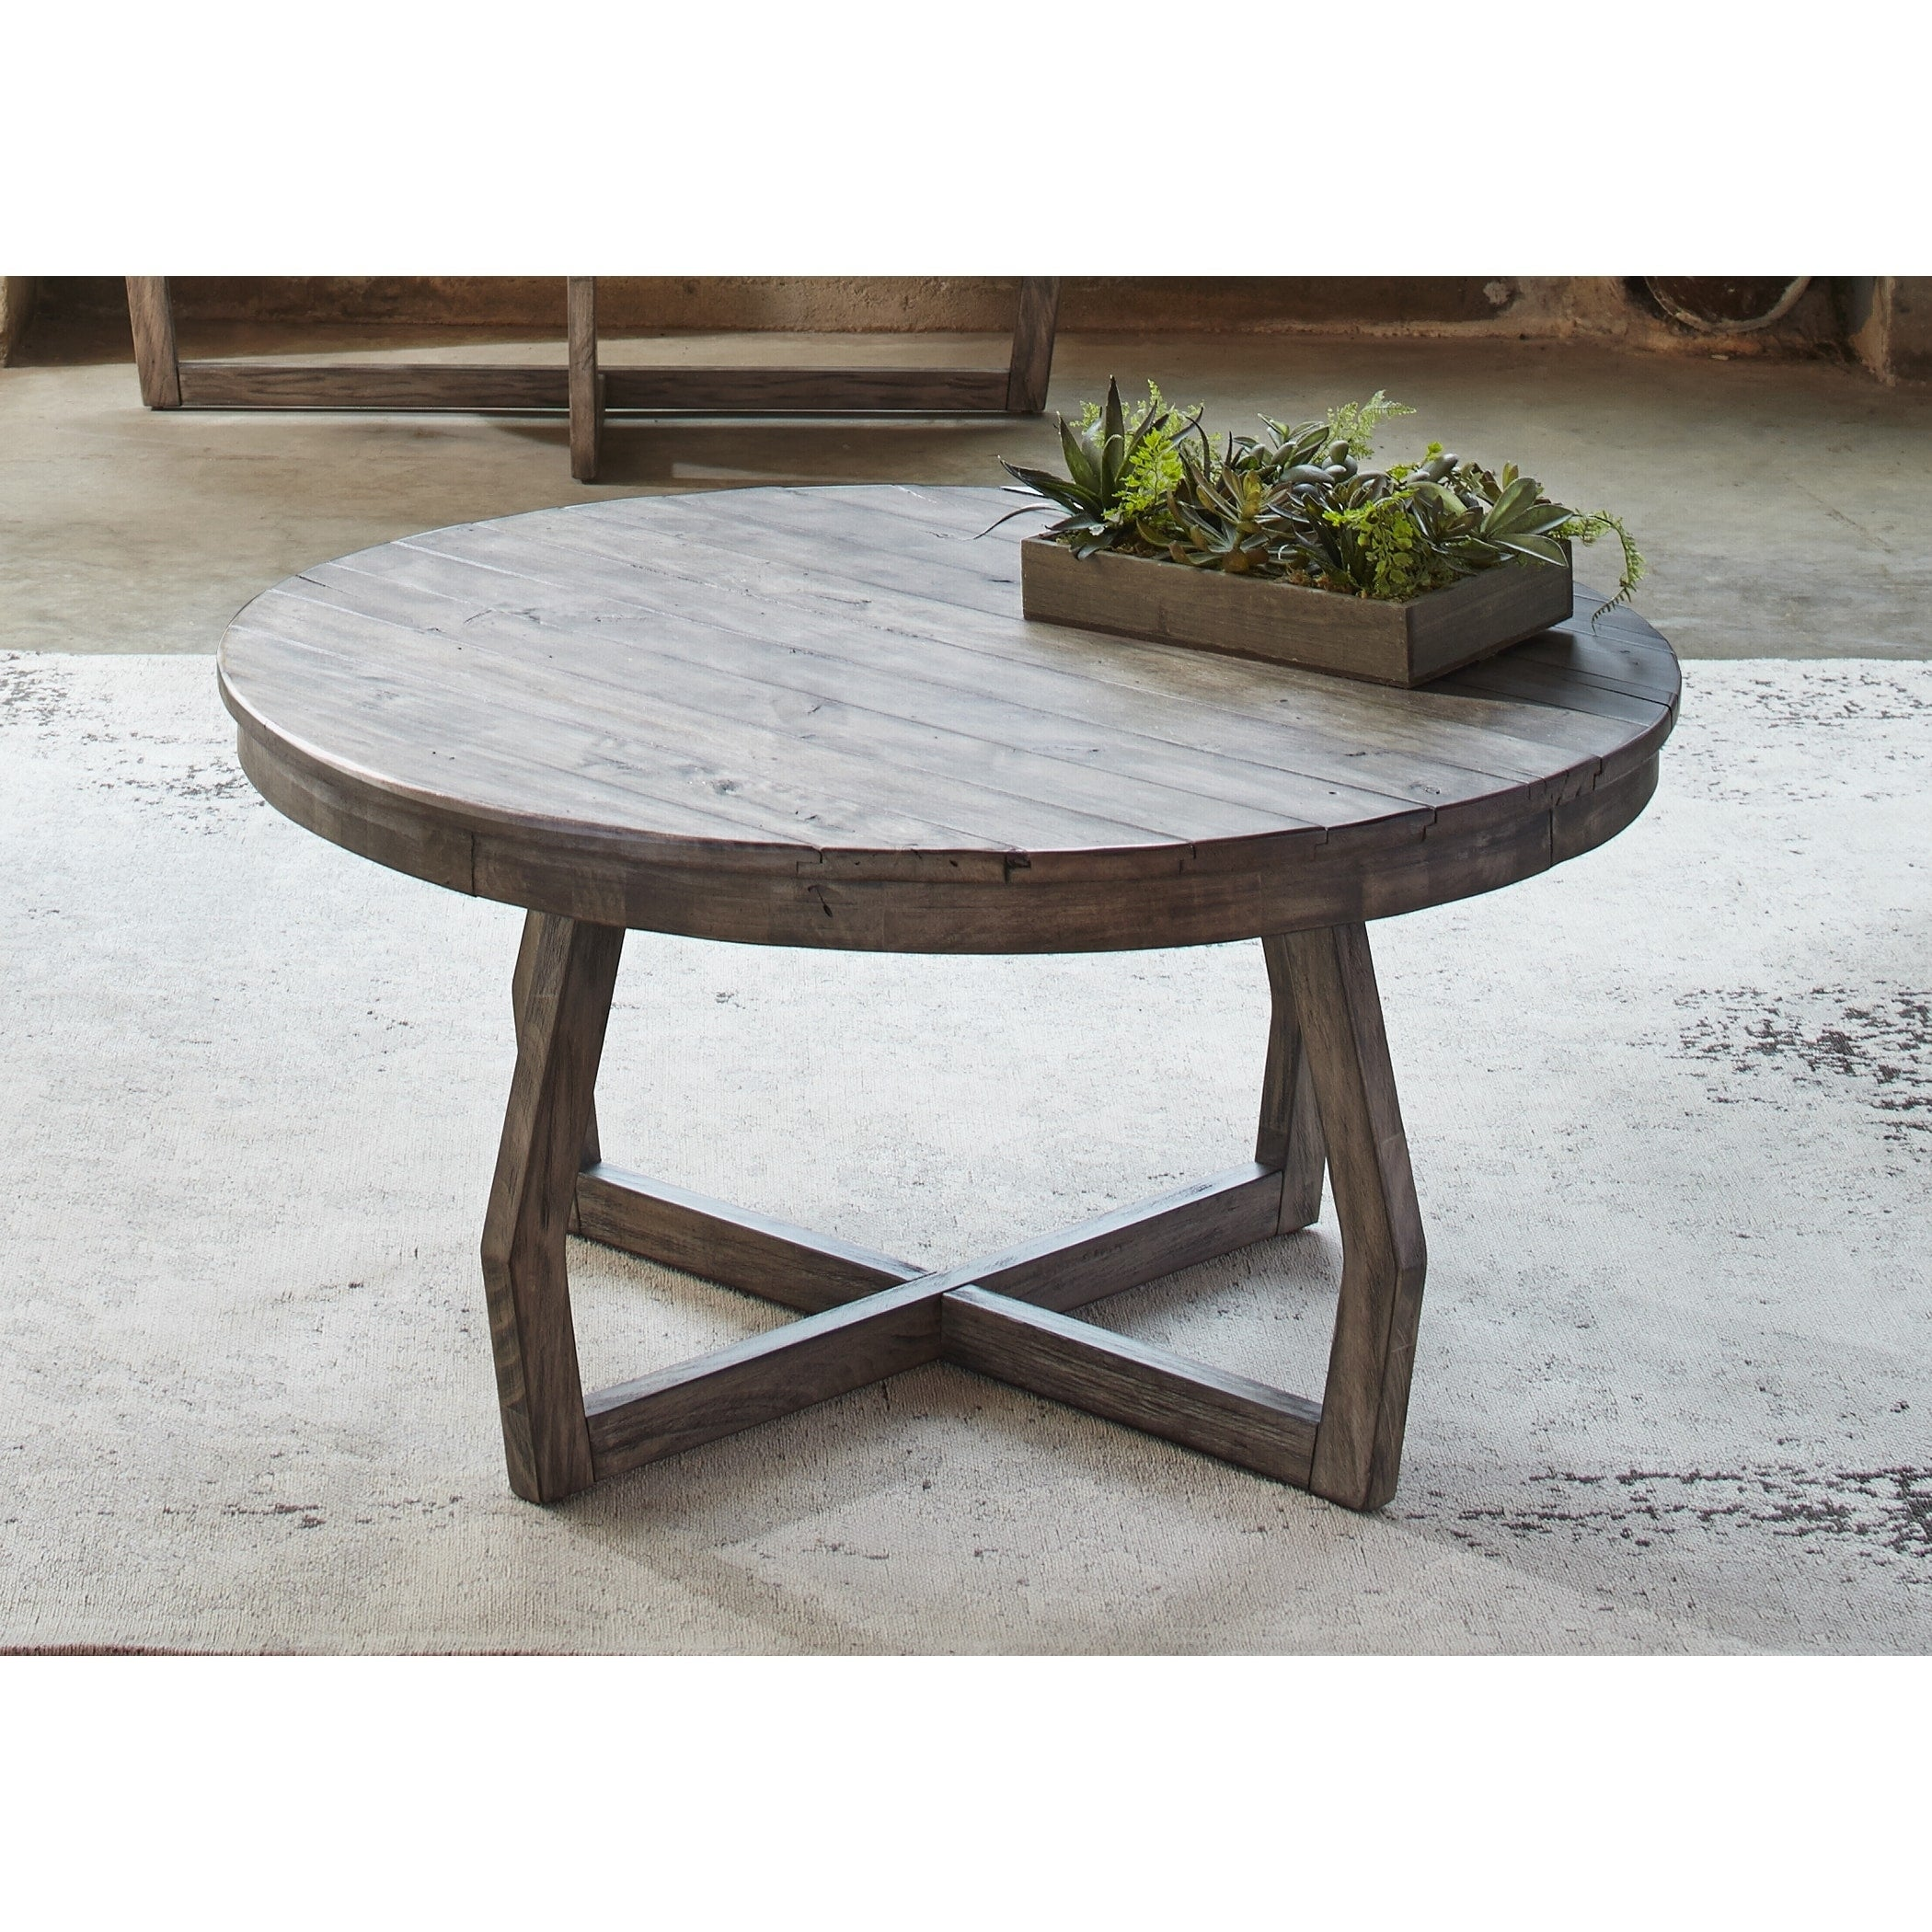 The Gray Barn Rosings Park Grey Wash Tail Table